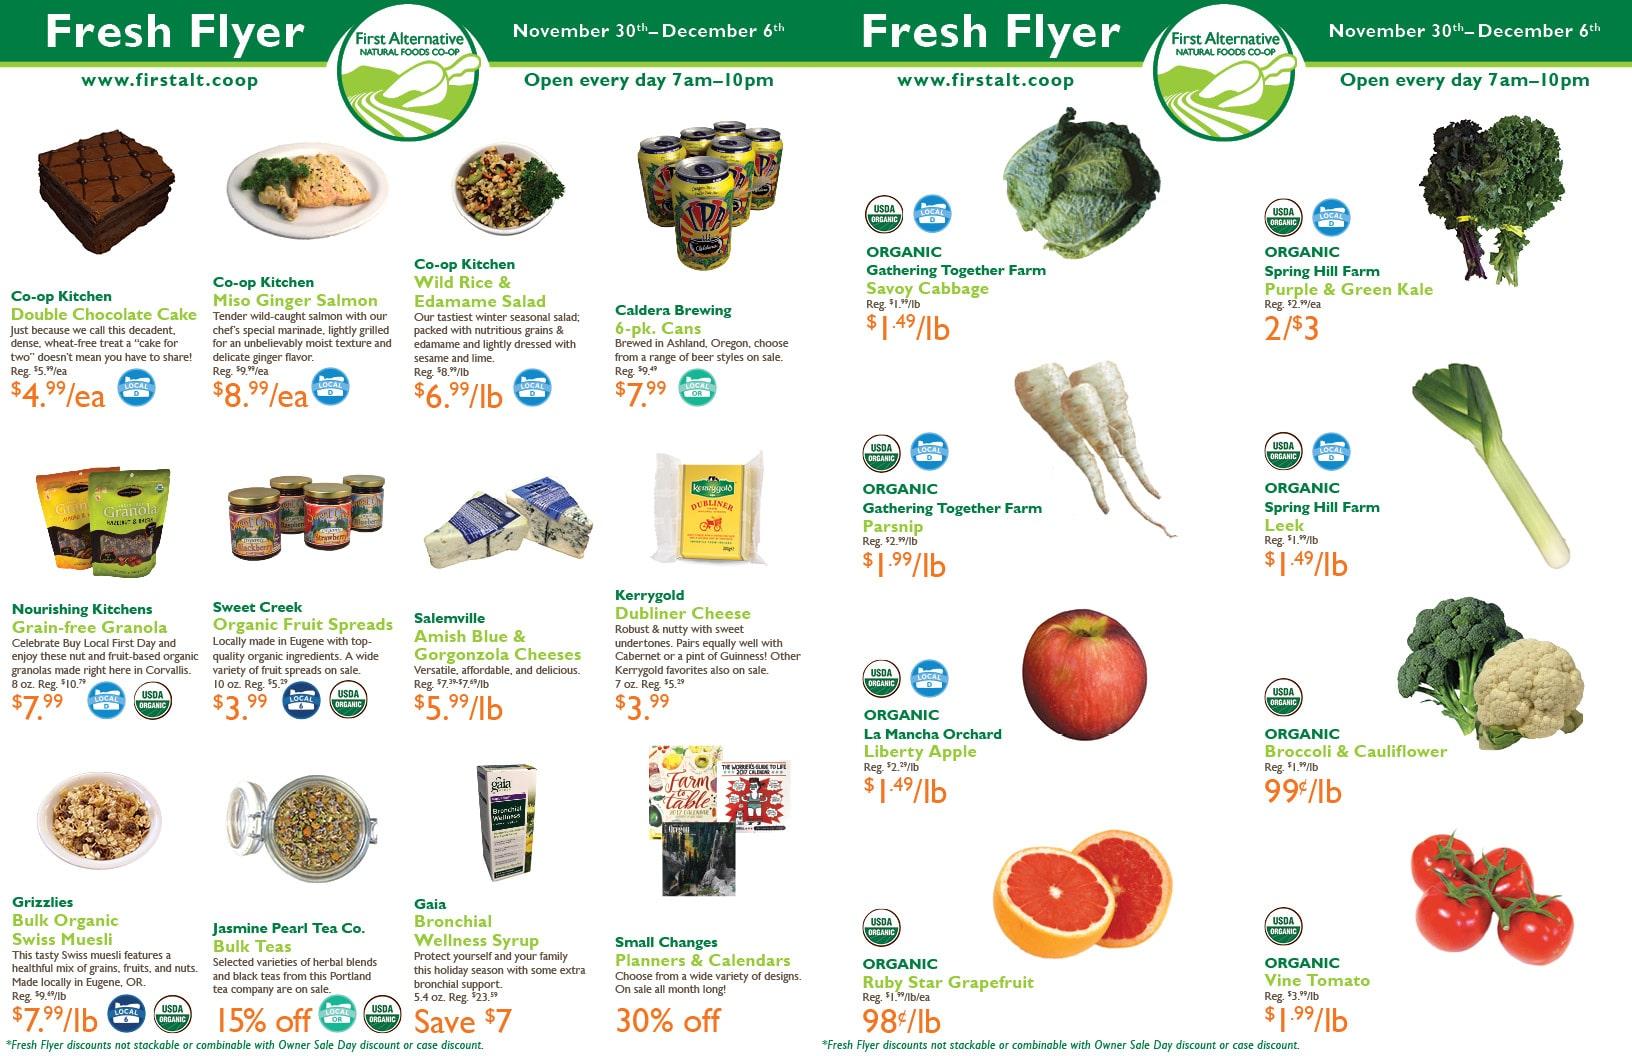 First Alternative Co-op Fresh Flyer Nov. 30-Dec. 6